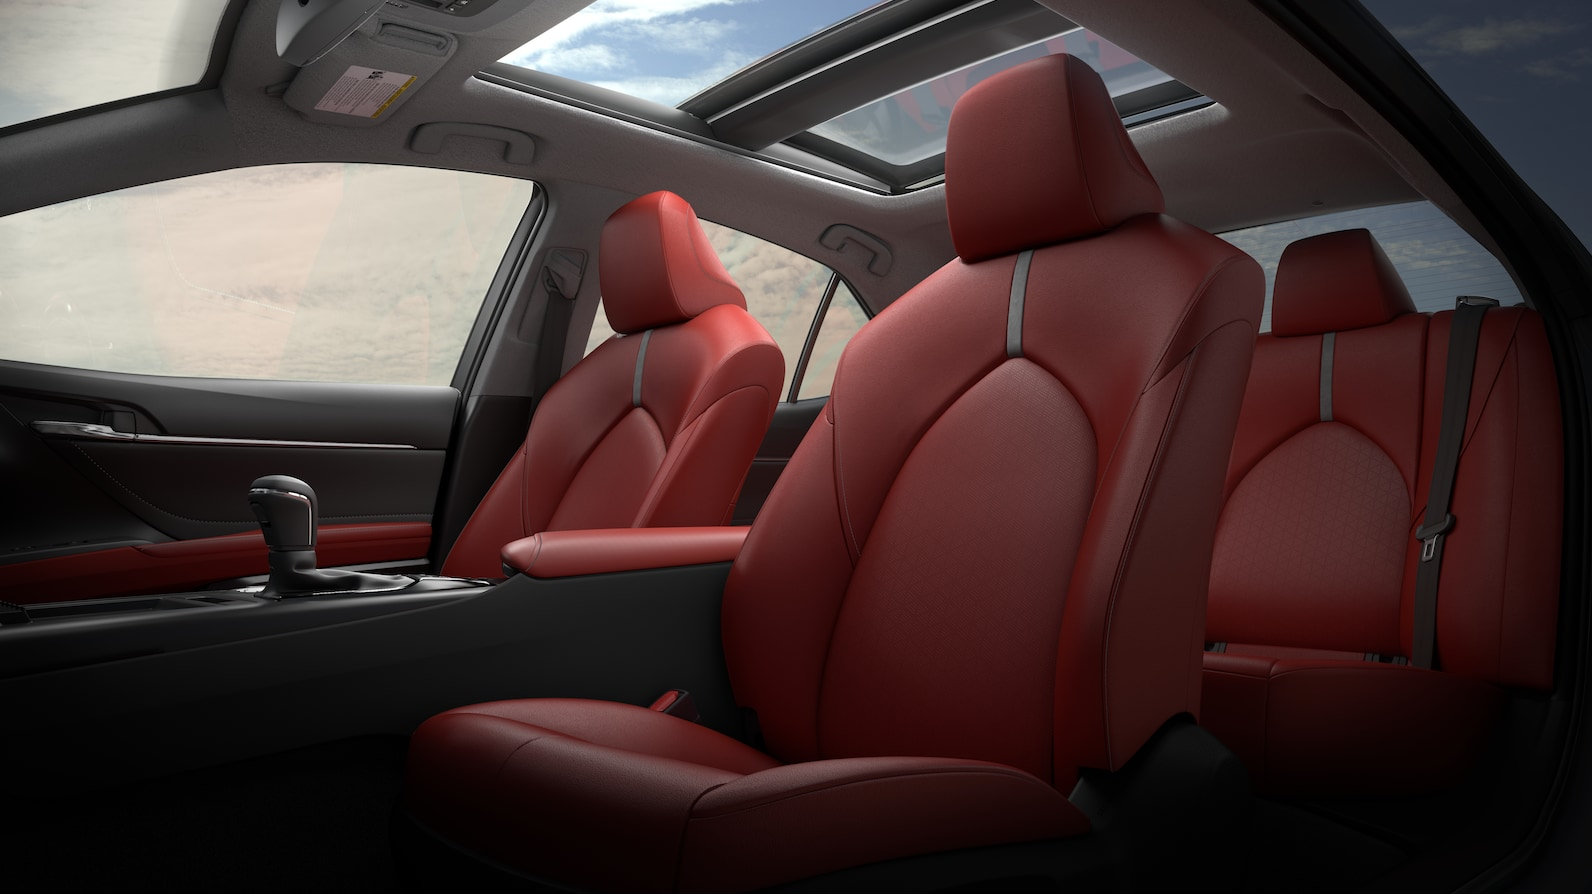 Toyota Camry red interior